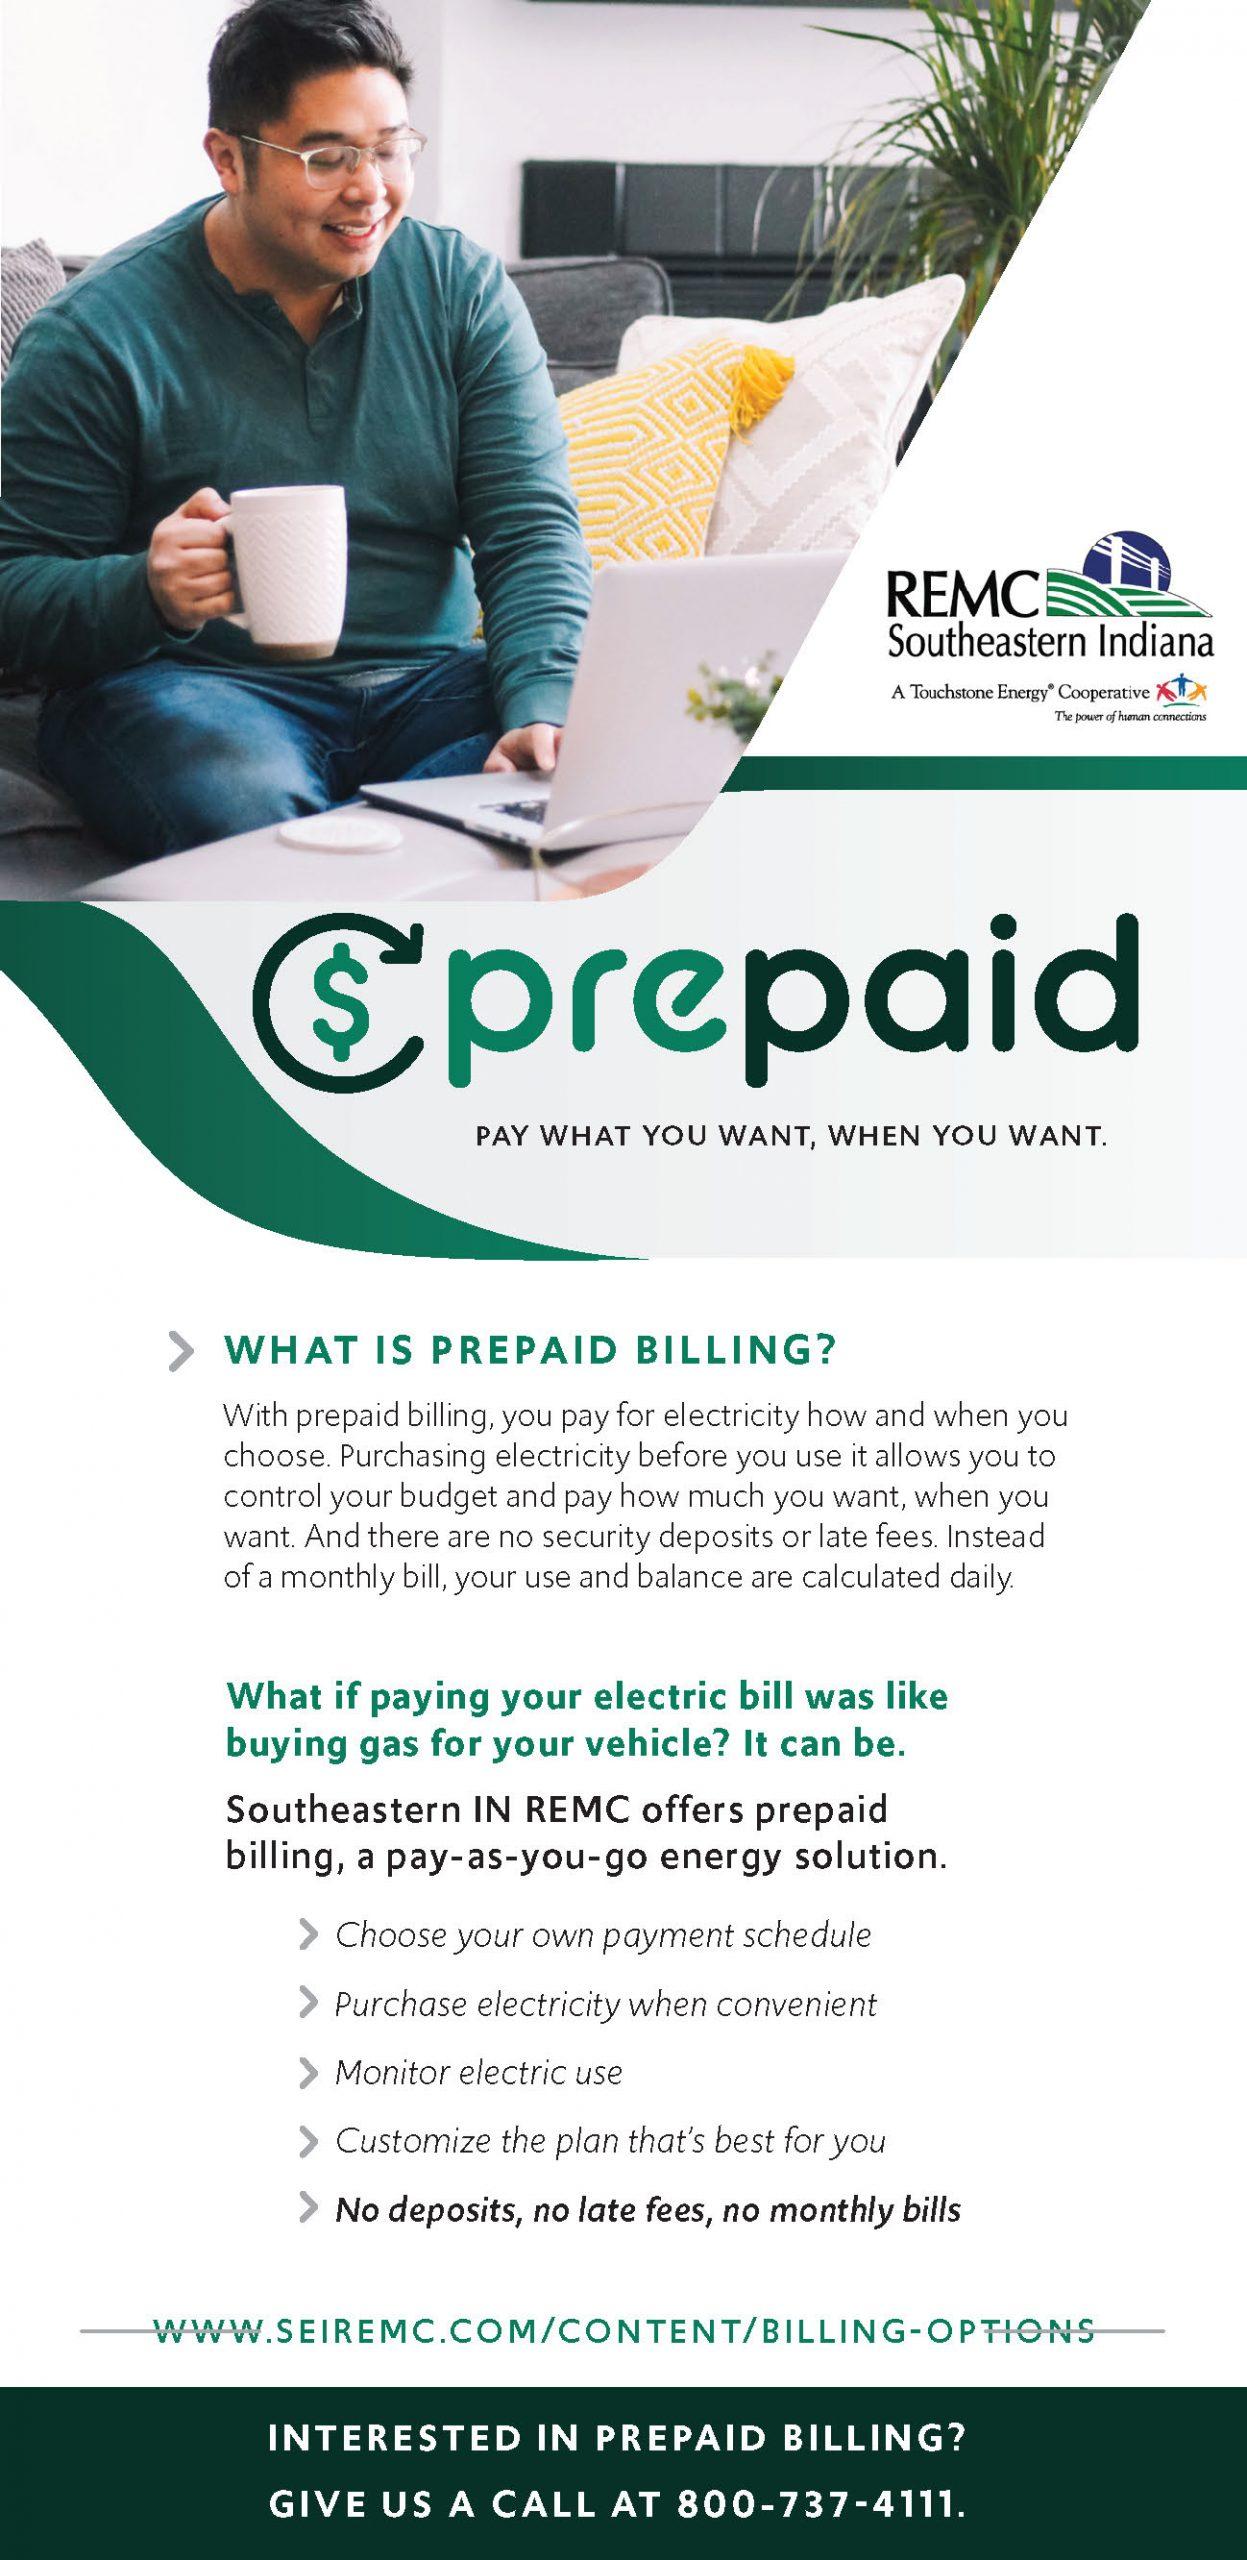 Prepaid ad